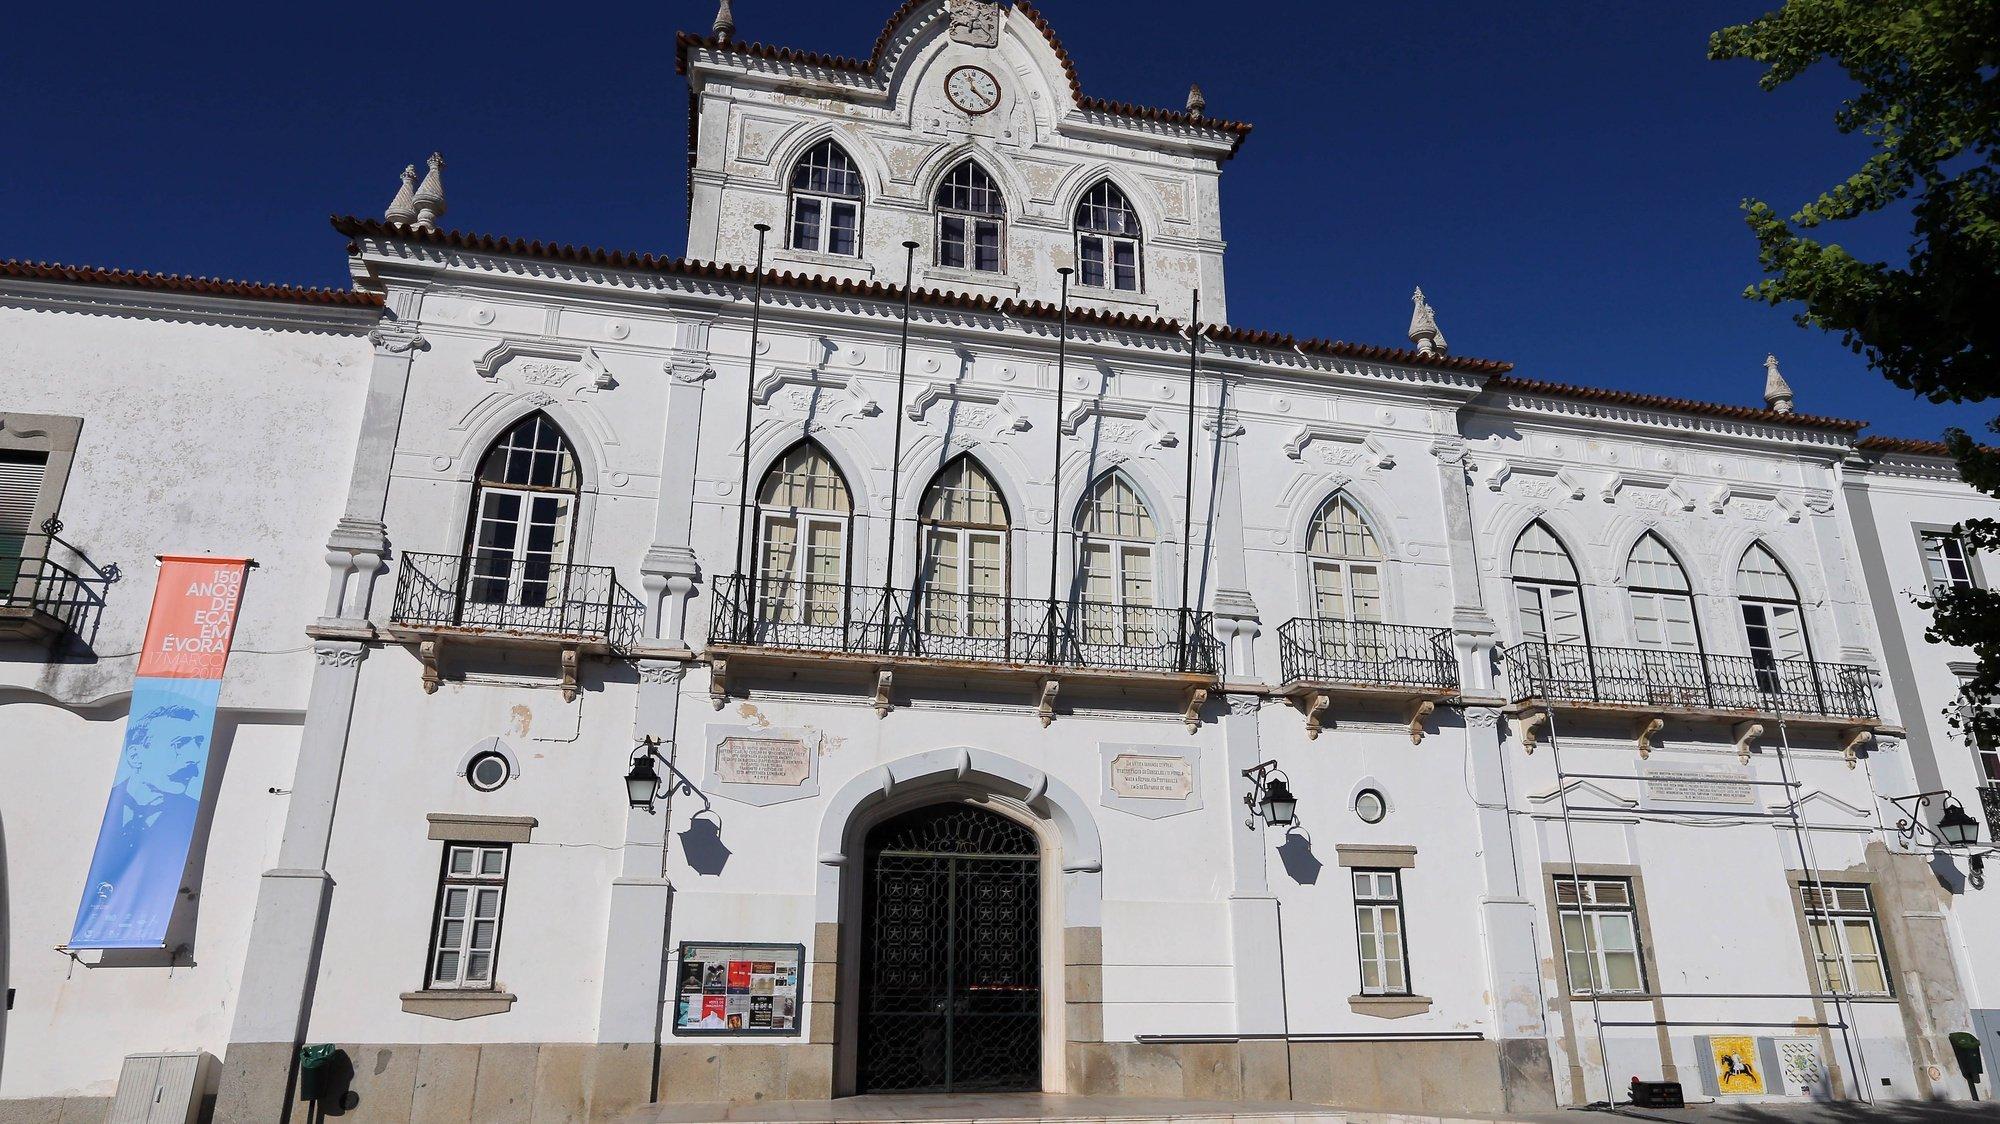 Fachada do edifício da Câmara Municipal de Évora, 28 de dezembro de 2017. NUNO VEIGA/LUSA